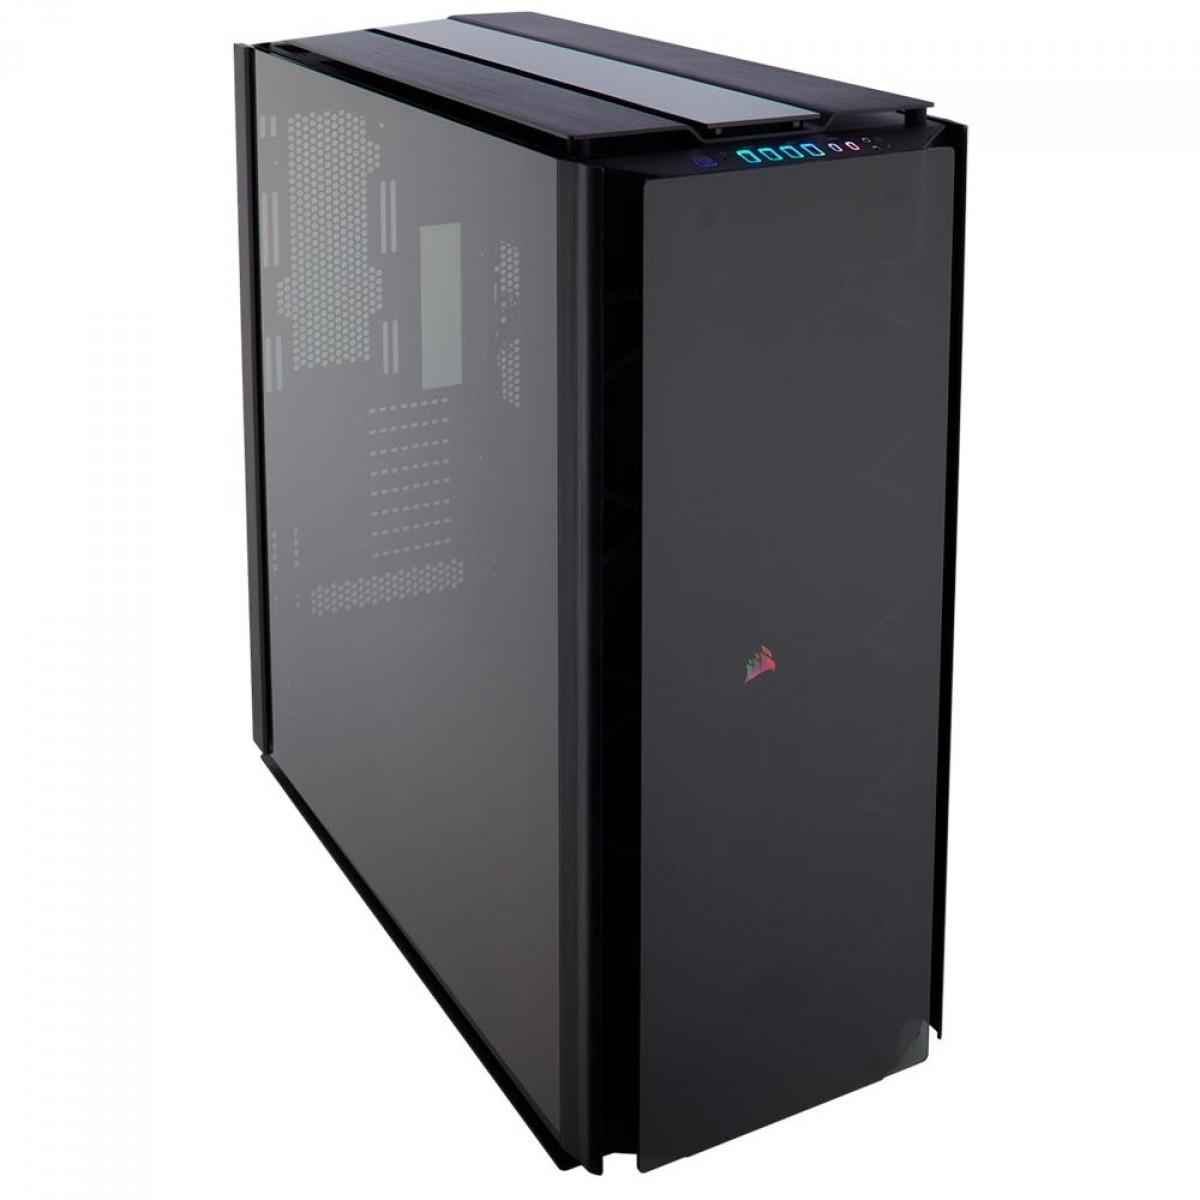 Gabinete Gamer Corsair Obsidian Series 1000D, RGB, Super Tower, Vidro temperado, Black, Sem Fonte, Sem Fan, CC-9011148-WW